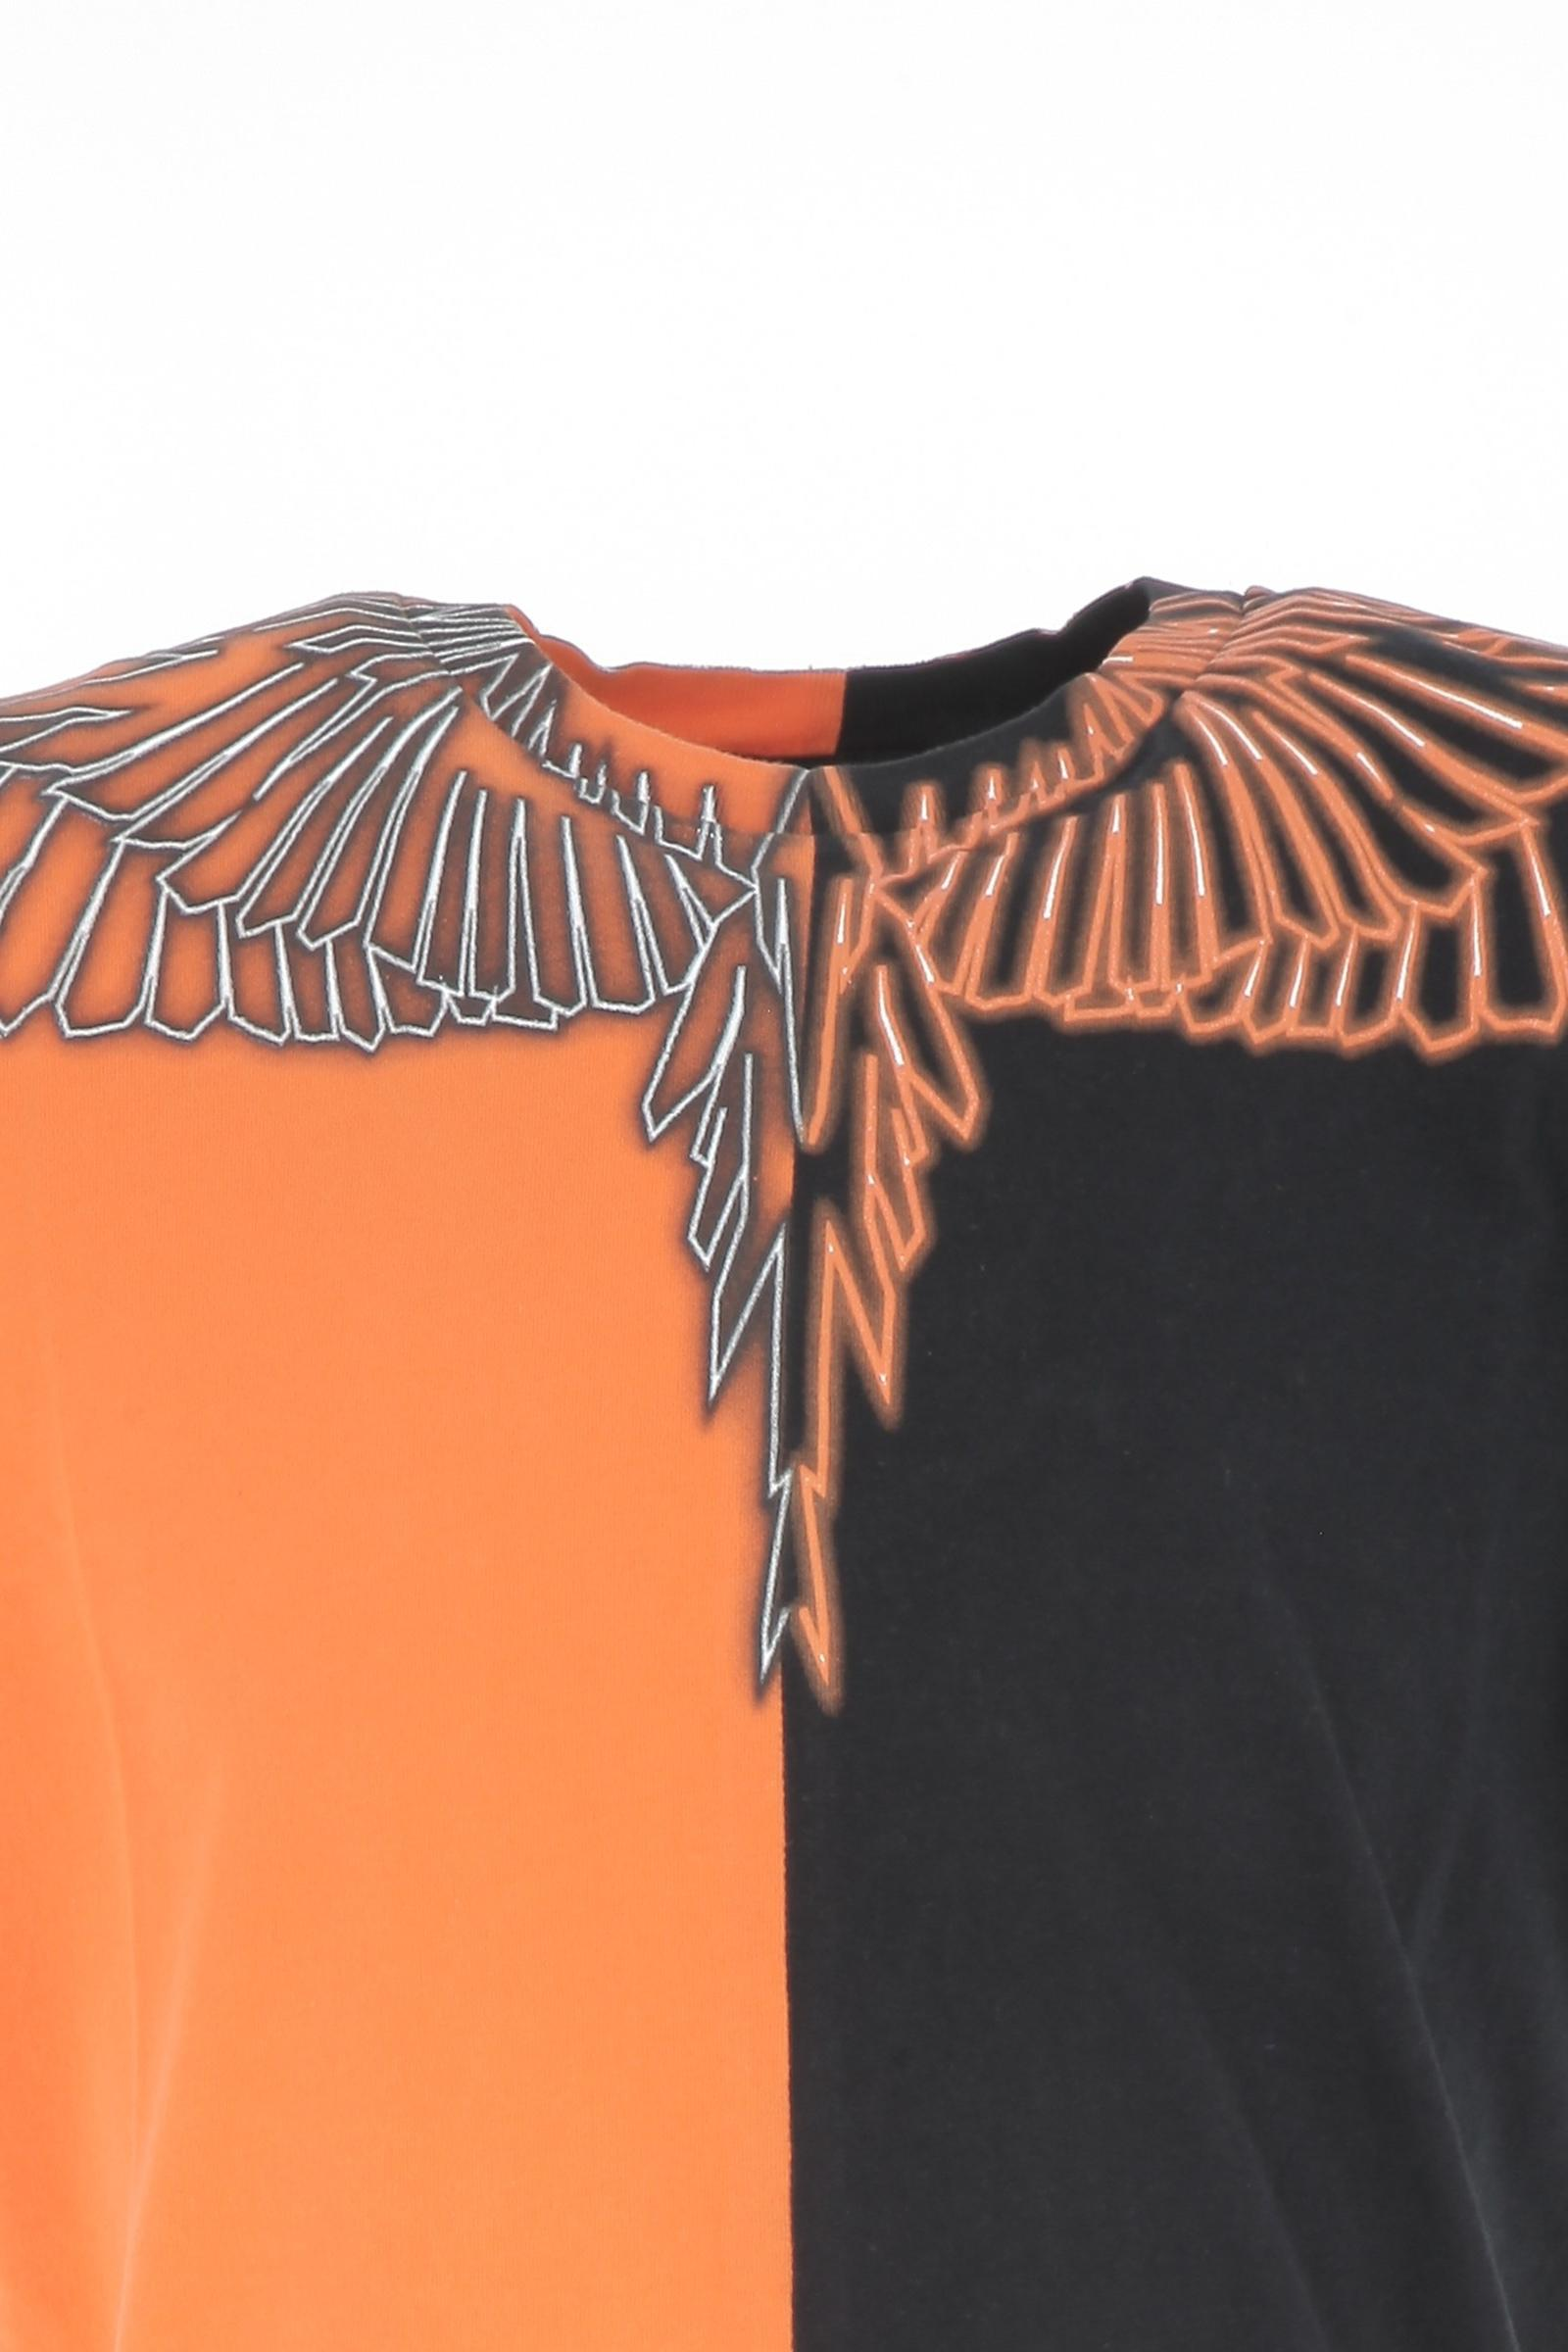 marcelo burlon t-shirt MARCELO BURLON KIDS OF MILAN | T-shirt | BMB11200010ESTB010